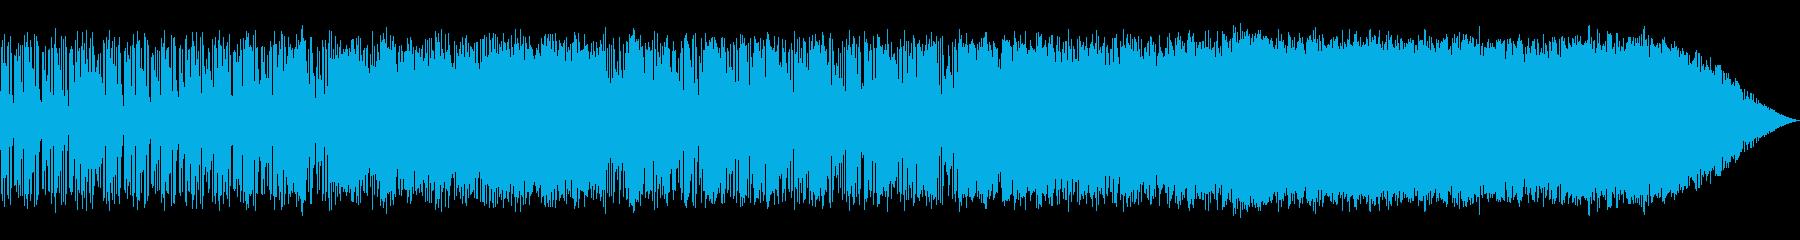 Mirageの再生済みの波形